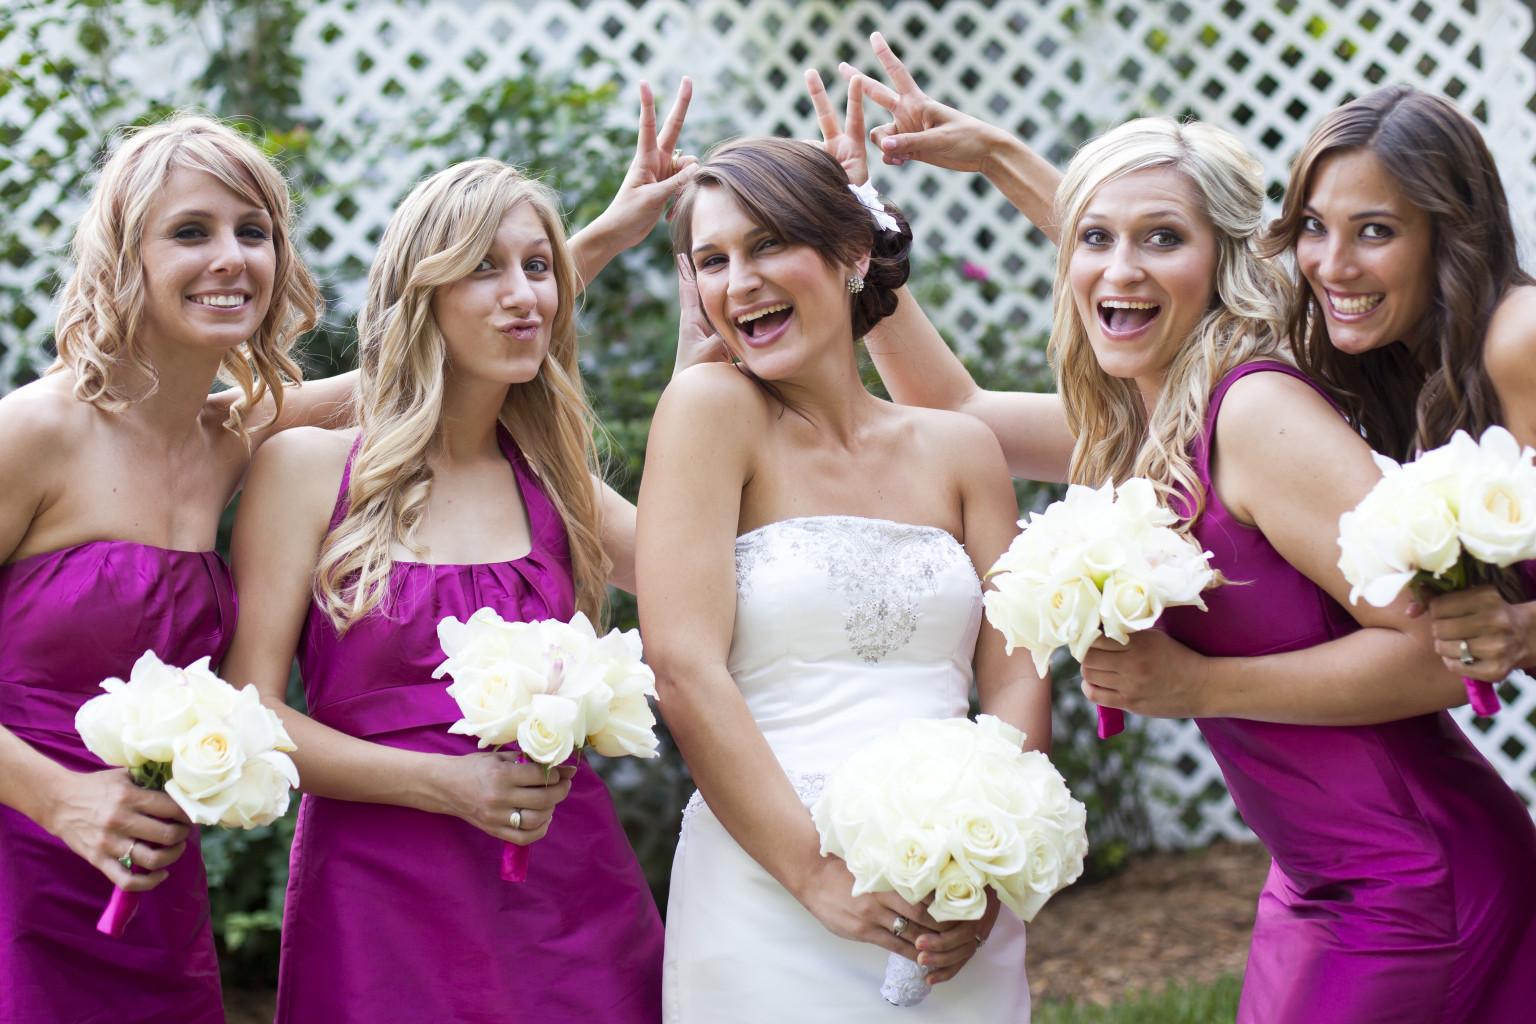 Women wearing wedding diapers - Women Wearing Wedding Diapers 3